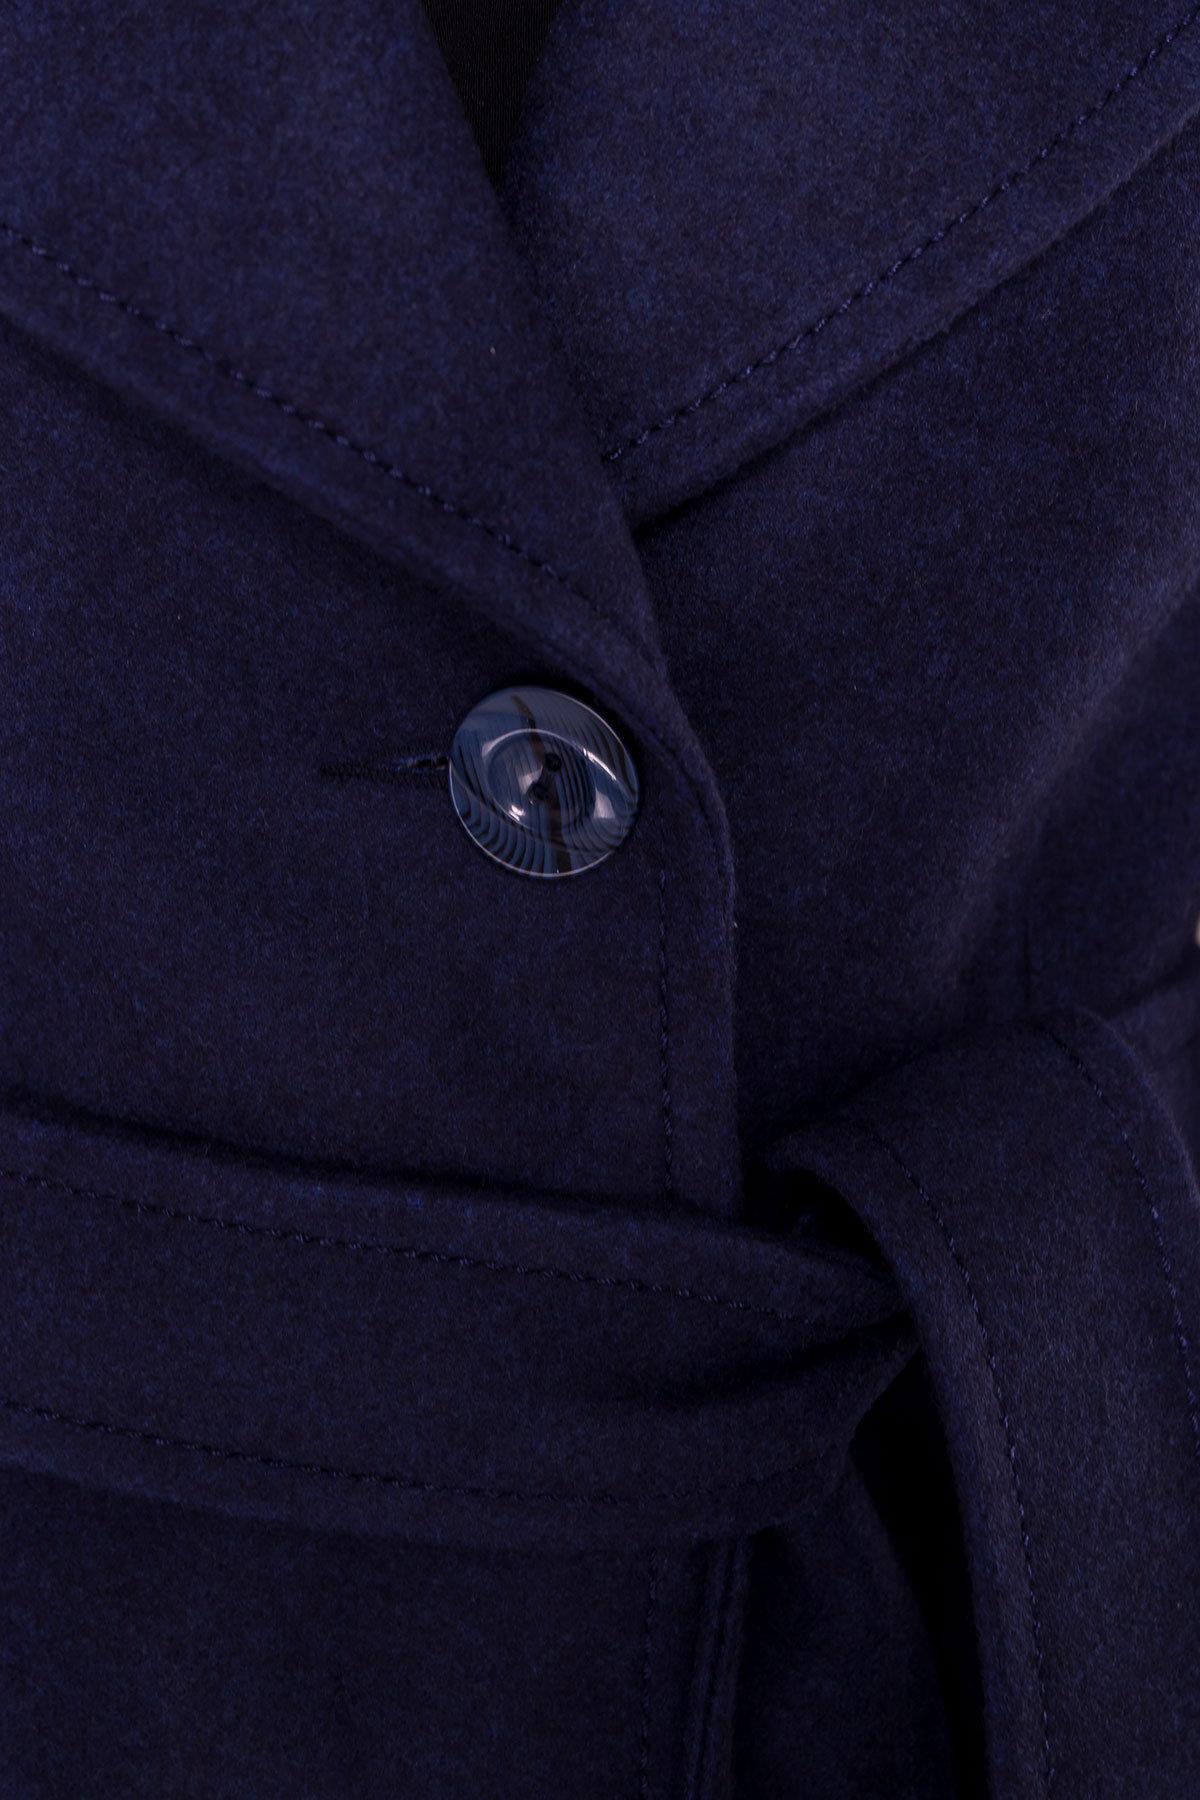 Пальто Камила 5373 АРТ. 36549 Цвет: Темно-синий 17 - фото 7, интернет магазин tm-modus.ru